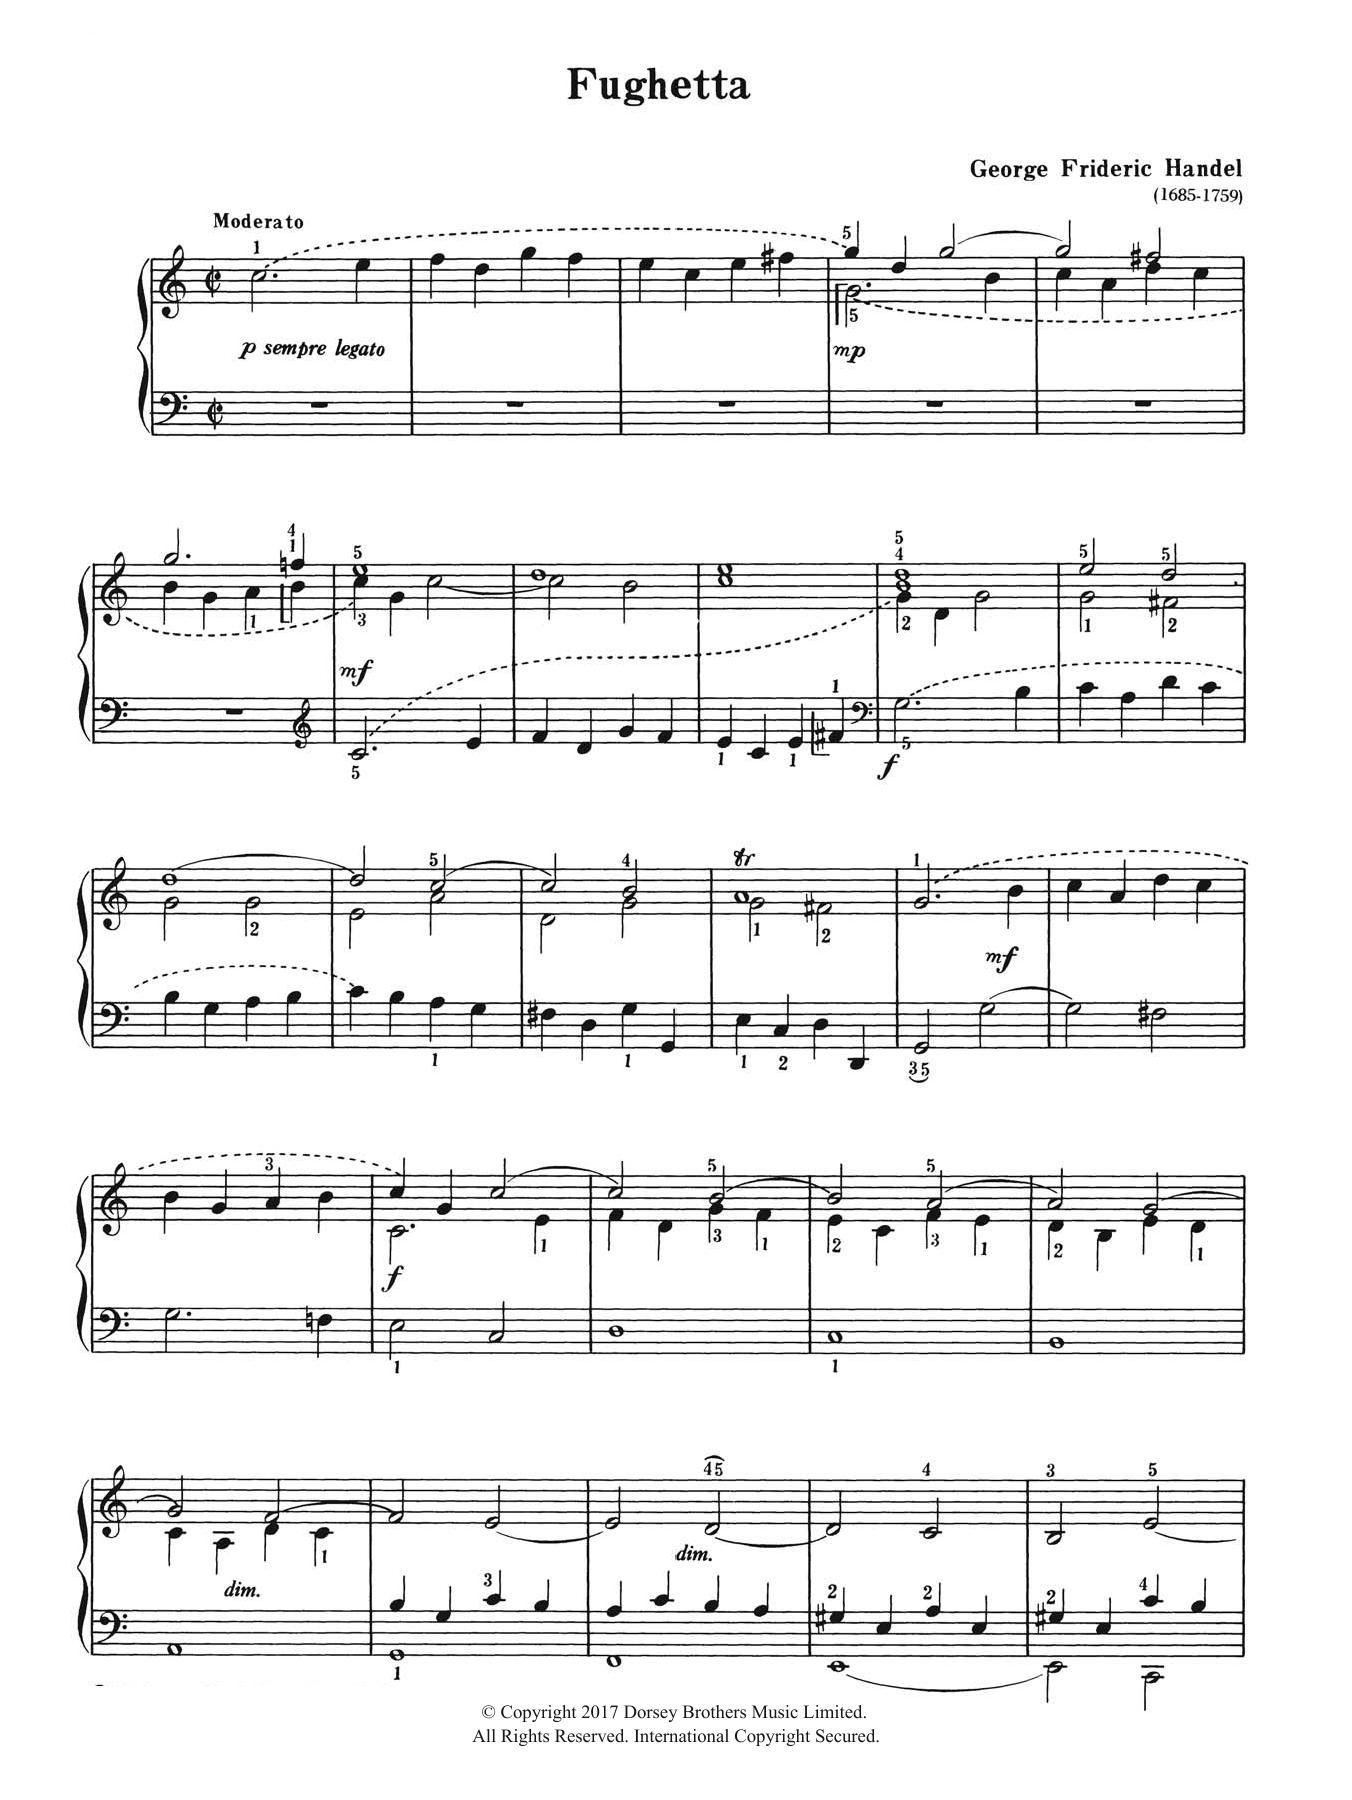 George Frideric Handel - Fughetta